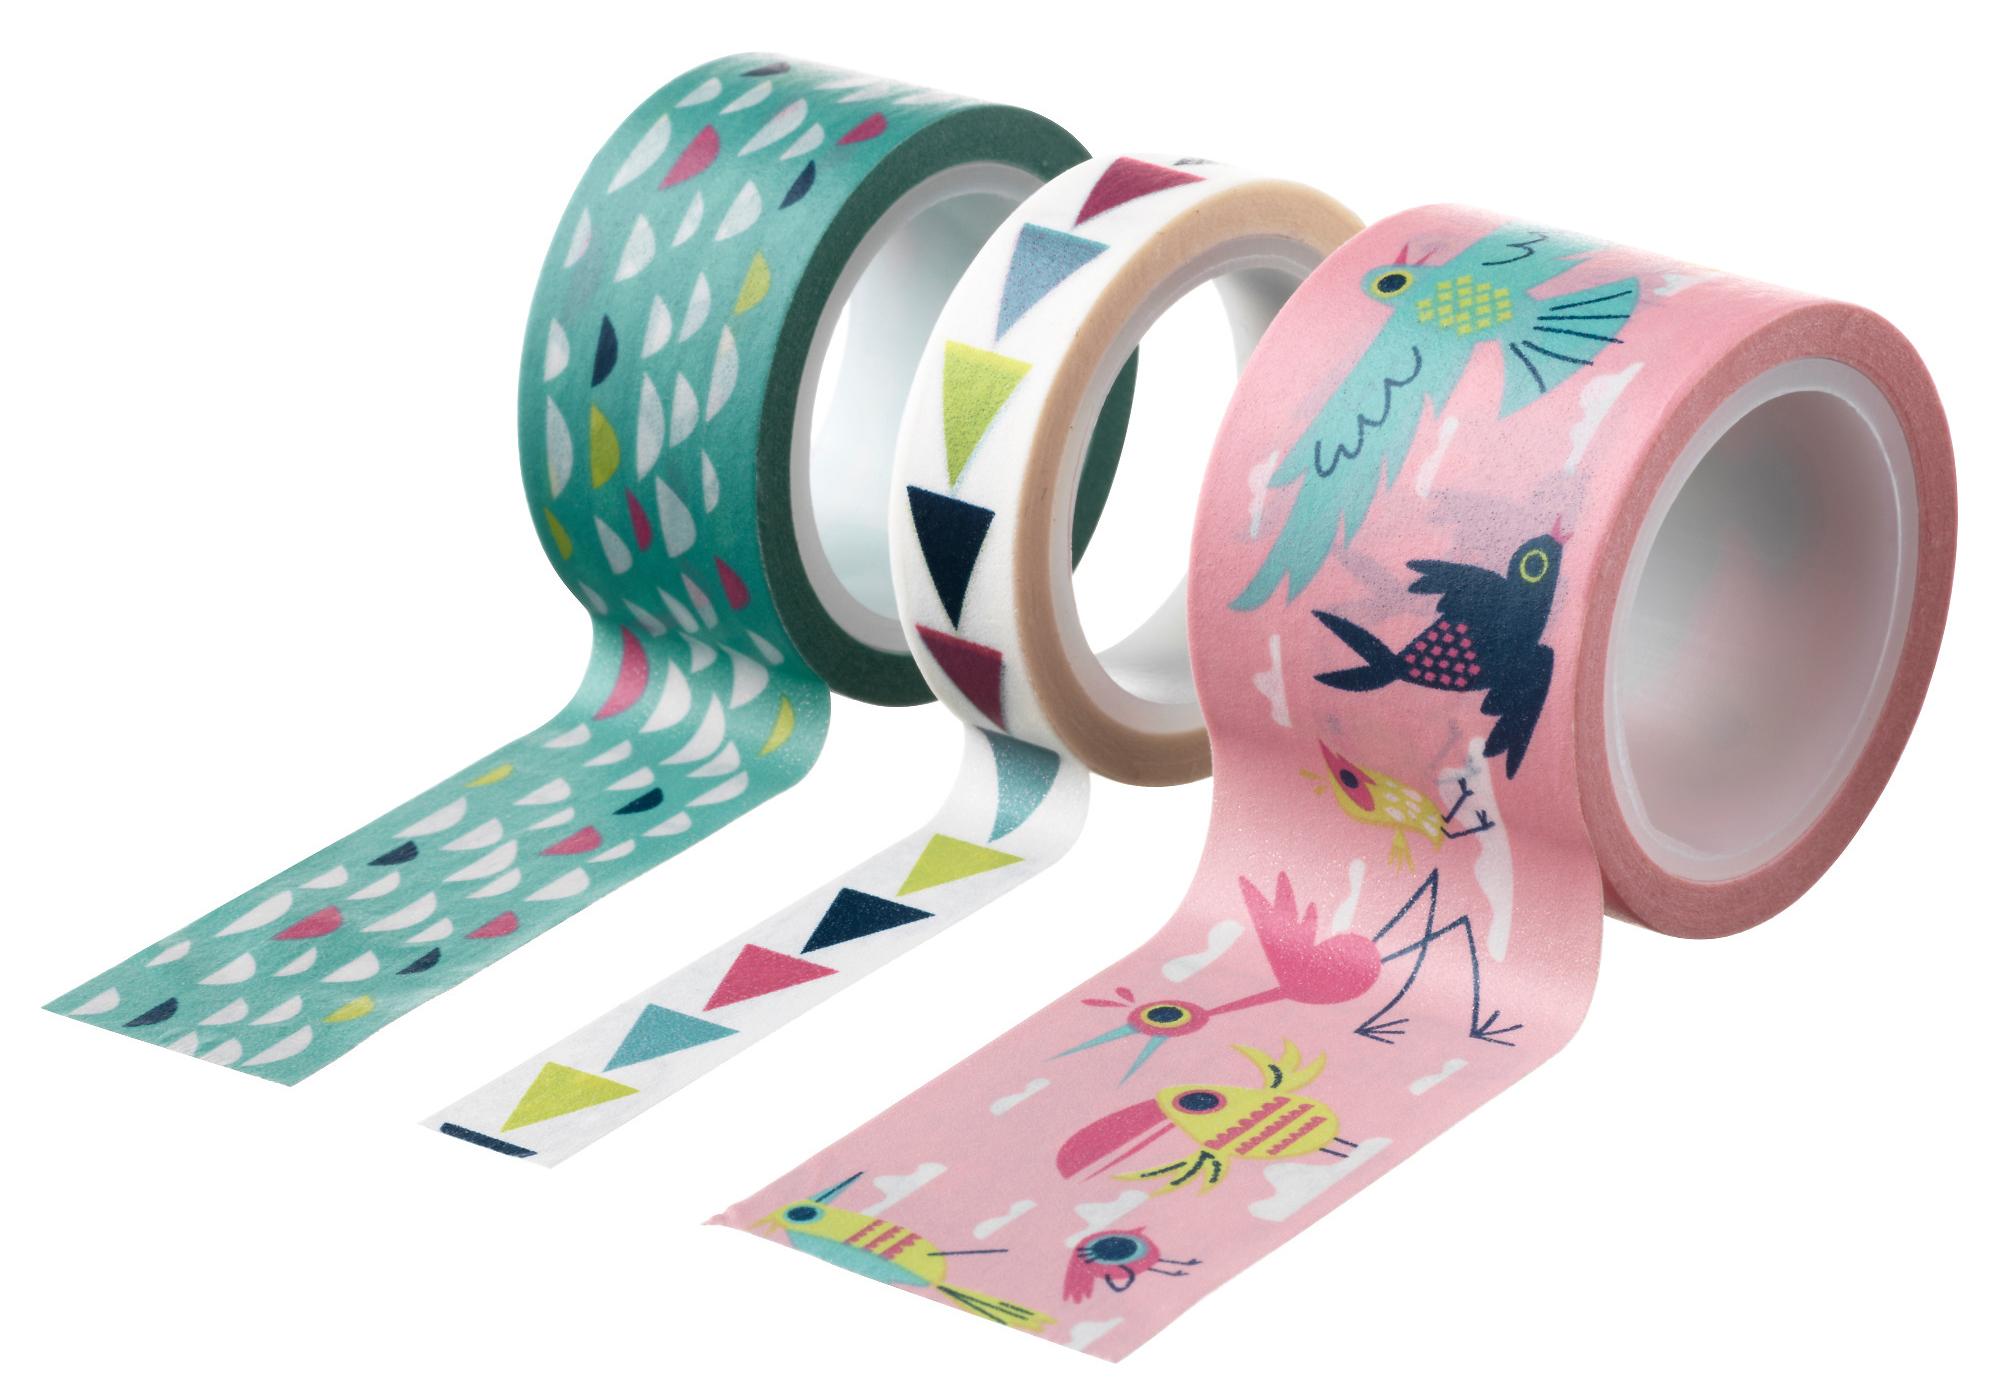 Ikea Washi tape